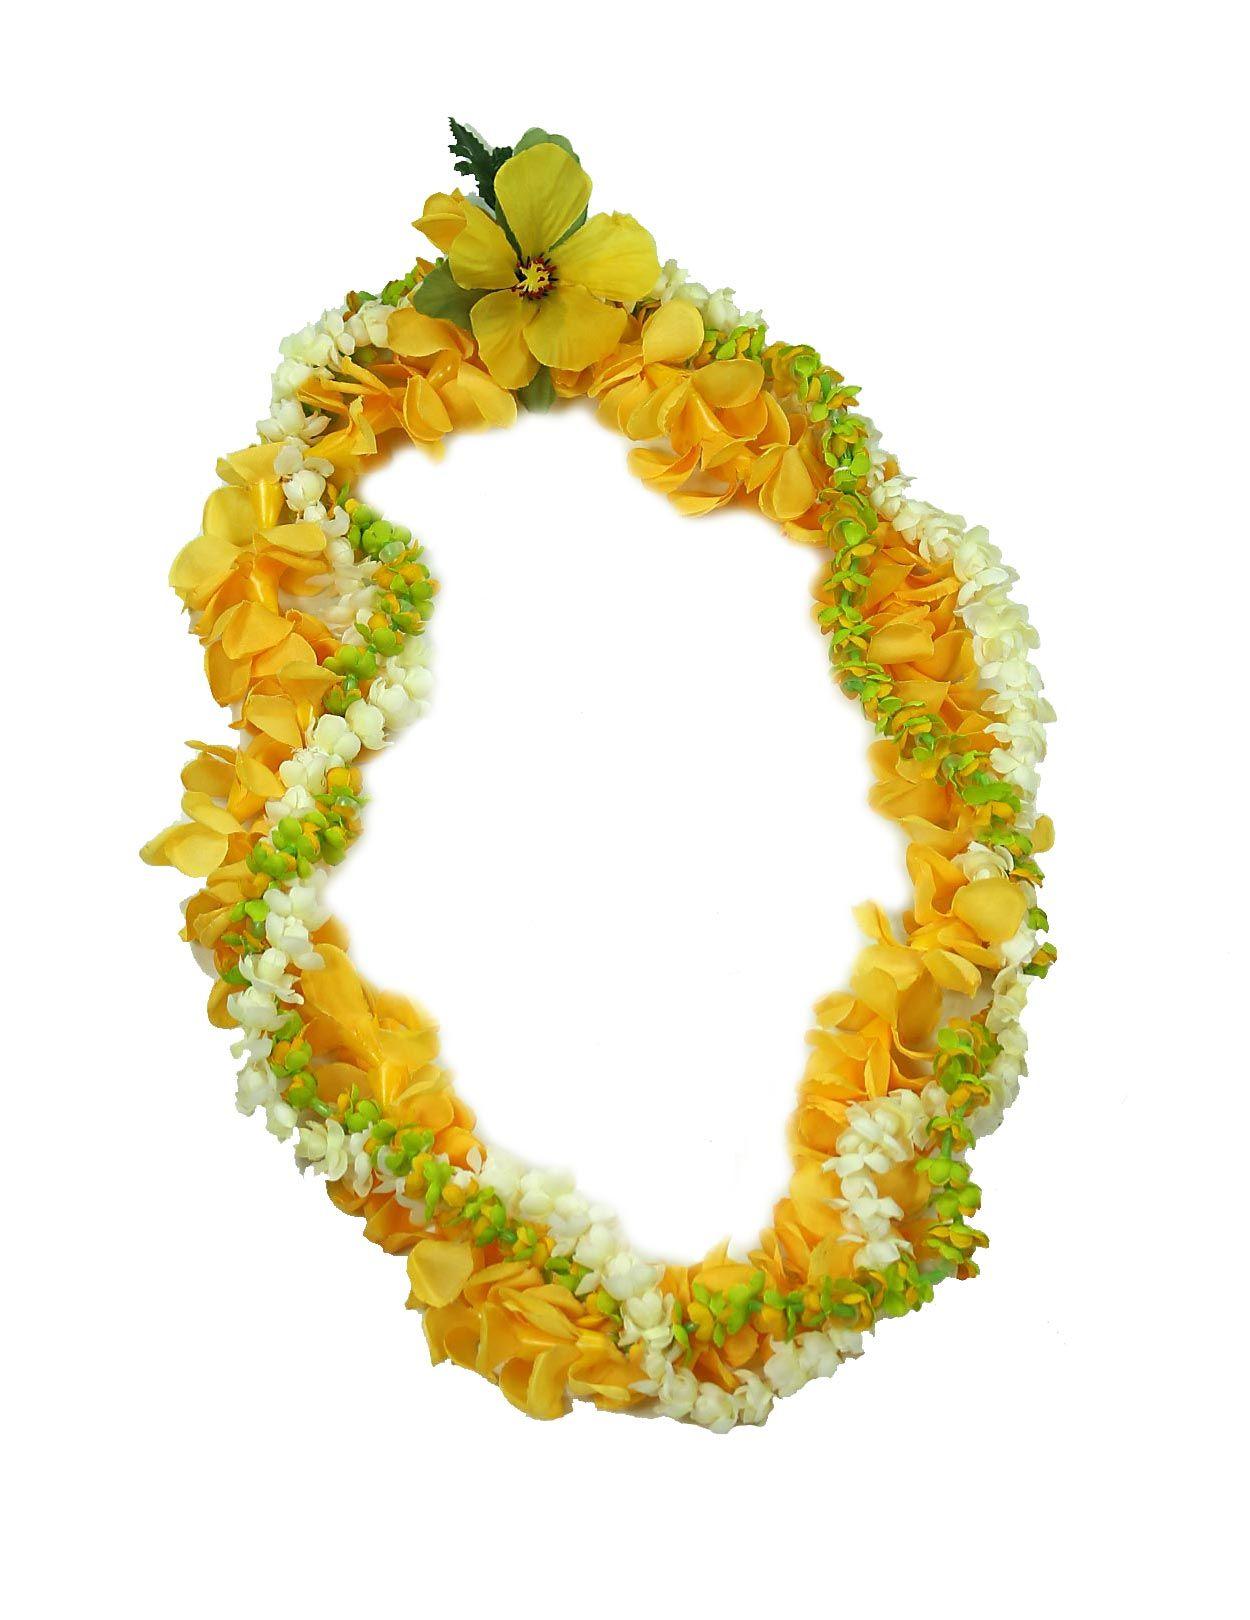 Check Out The Deal On Pakalana Pikake Puakenikeni Twirl Silk Flower